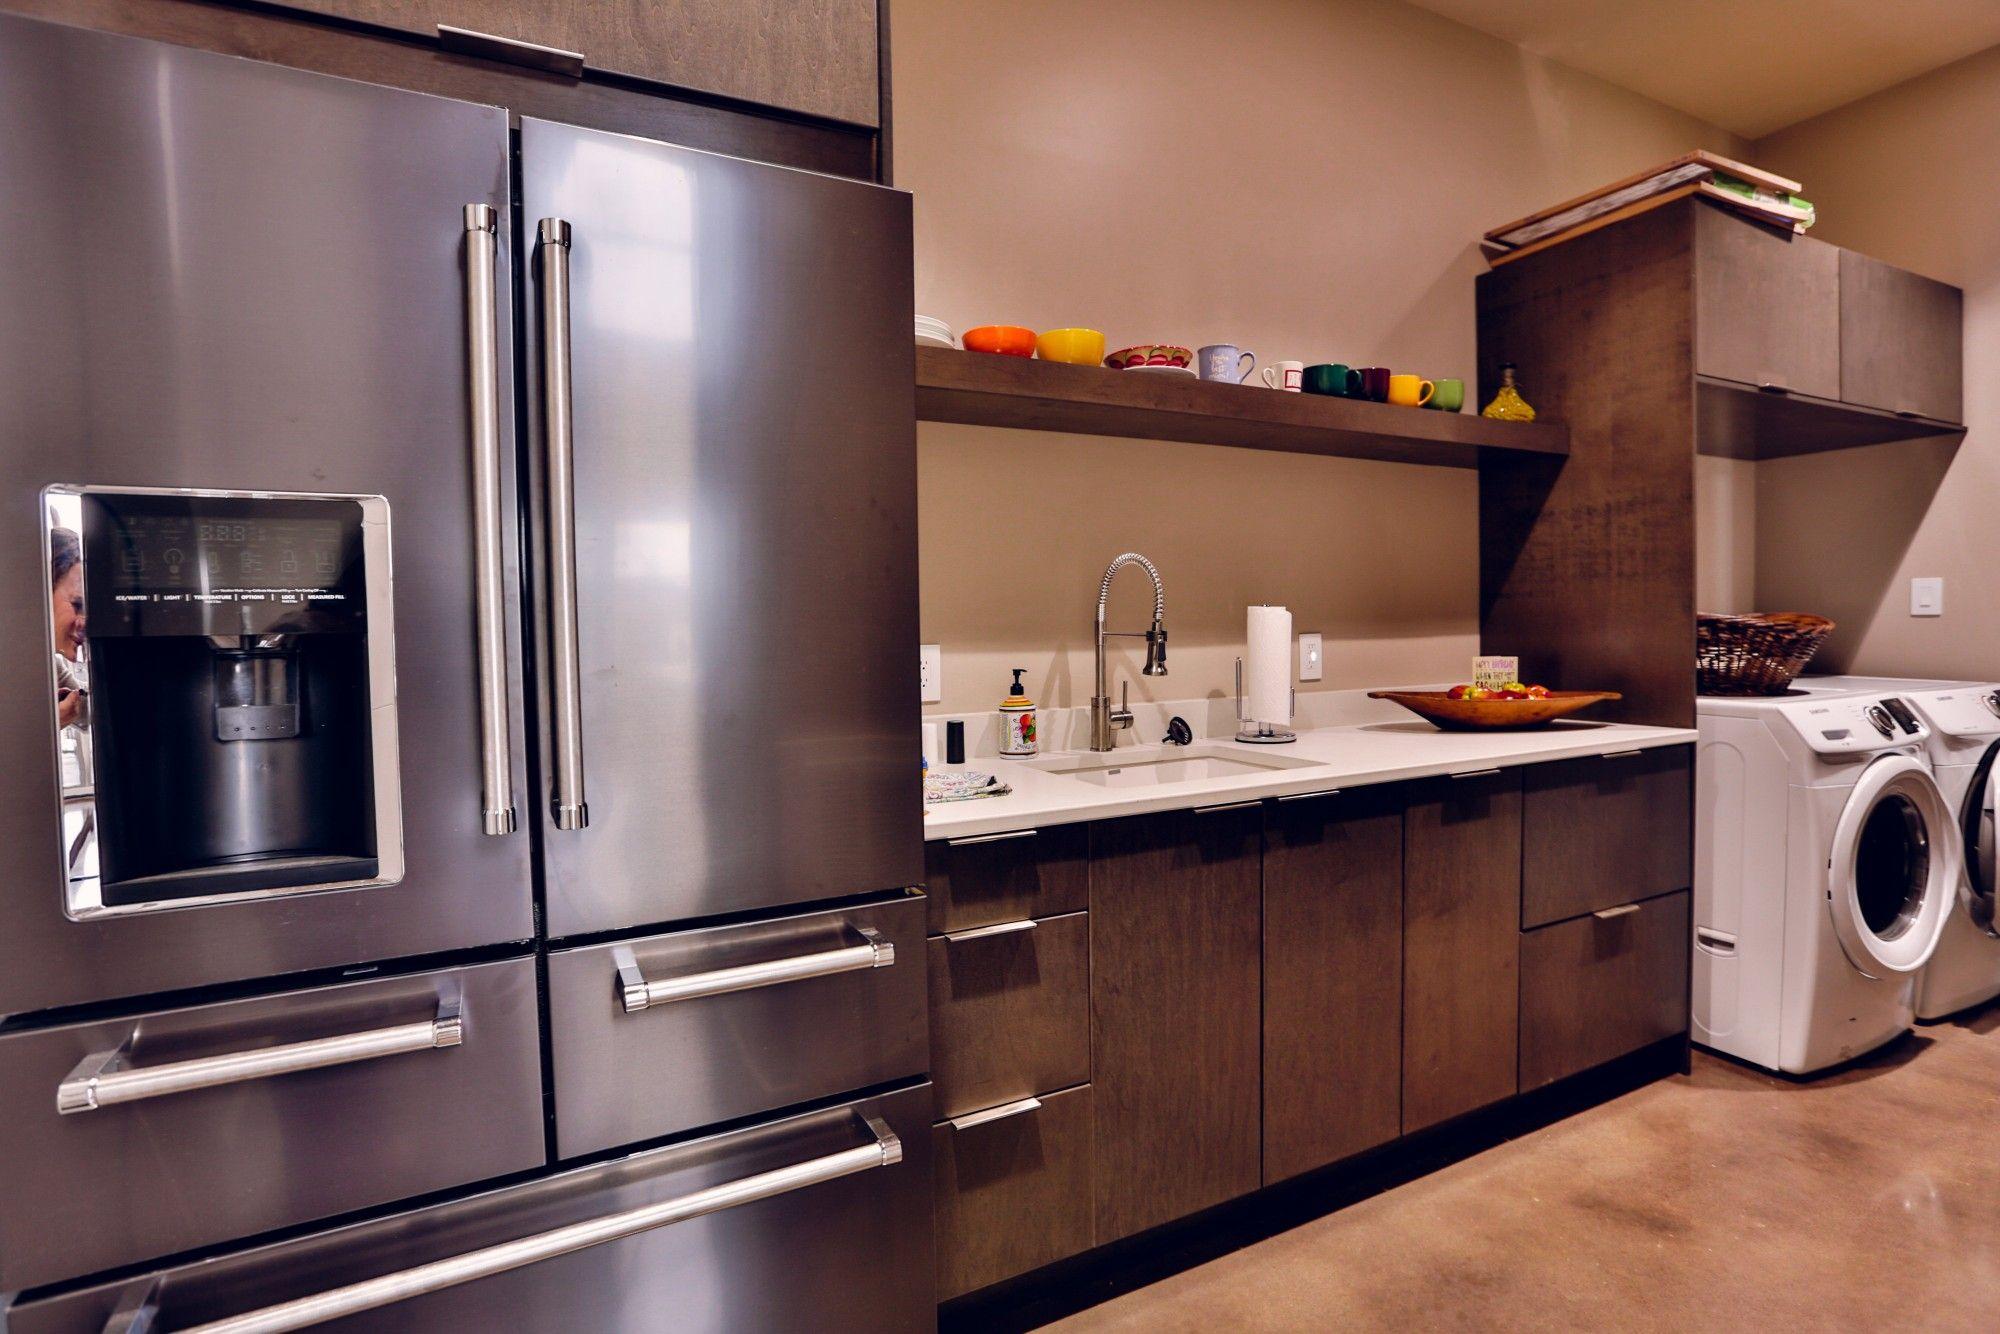 Kitchen Kraft Maple Summit Thunder Frameless Cabinets Caesarstone